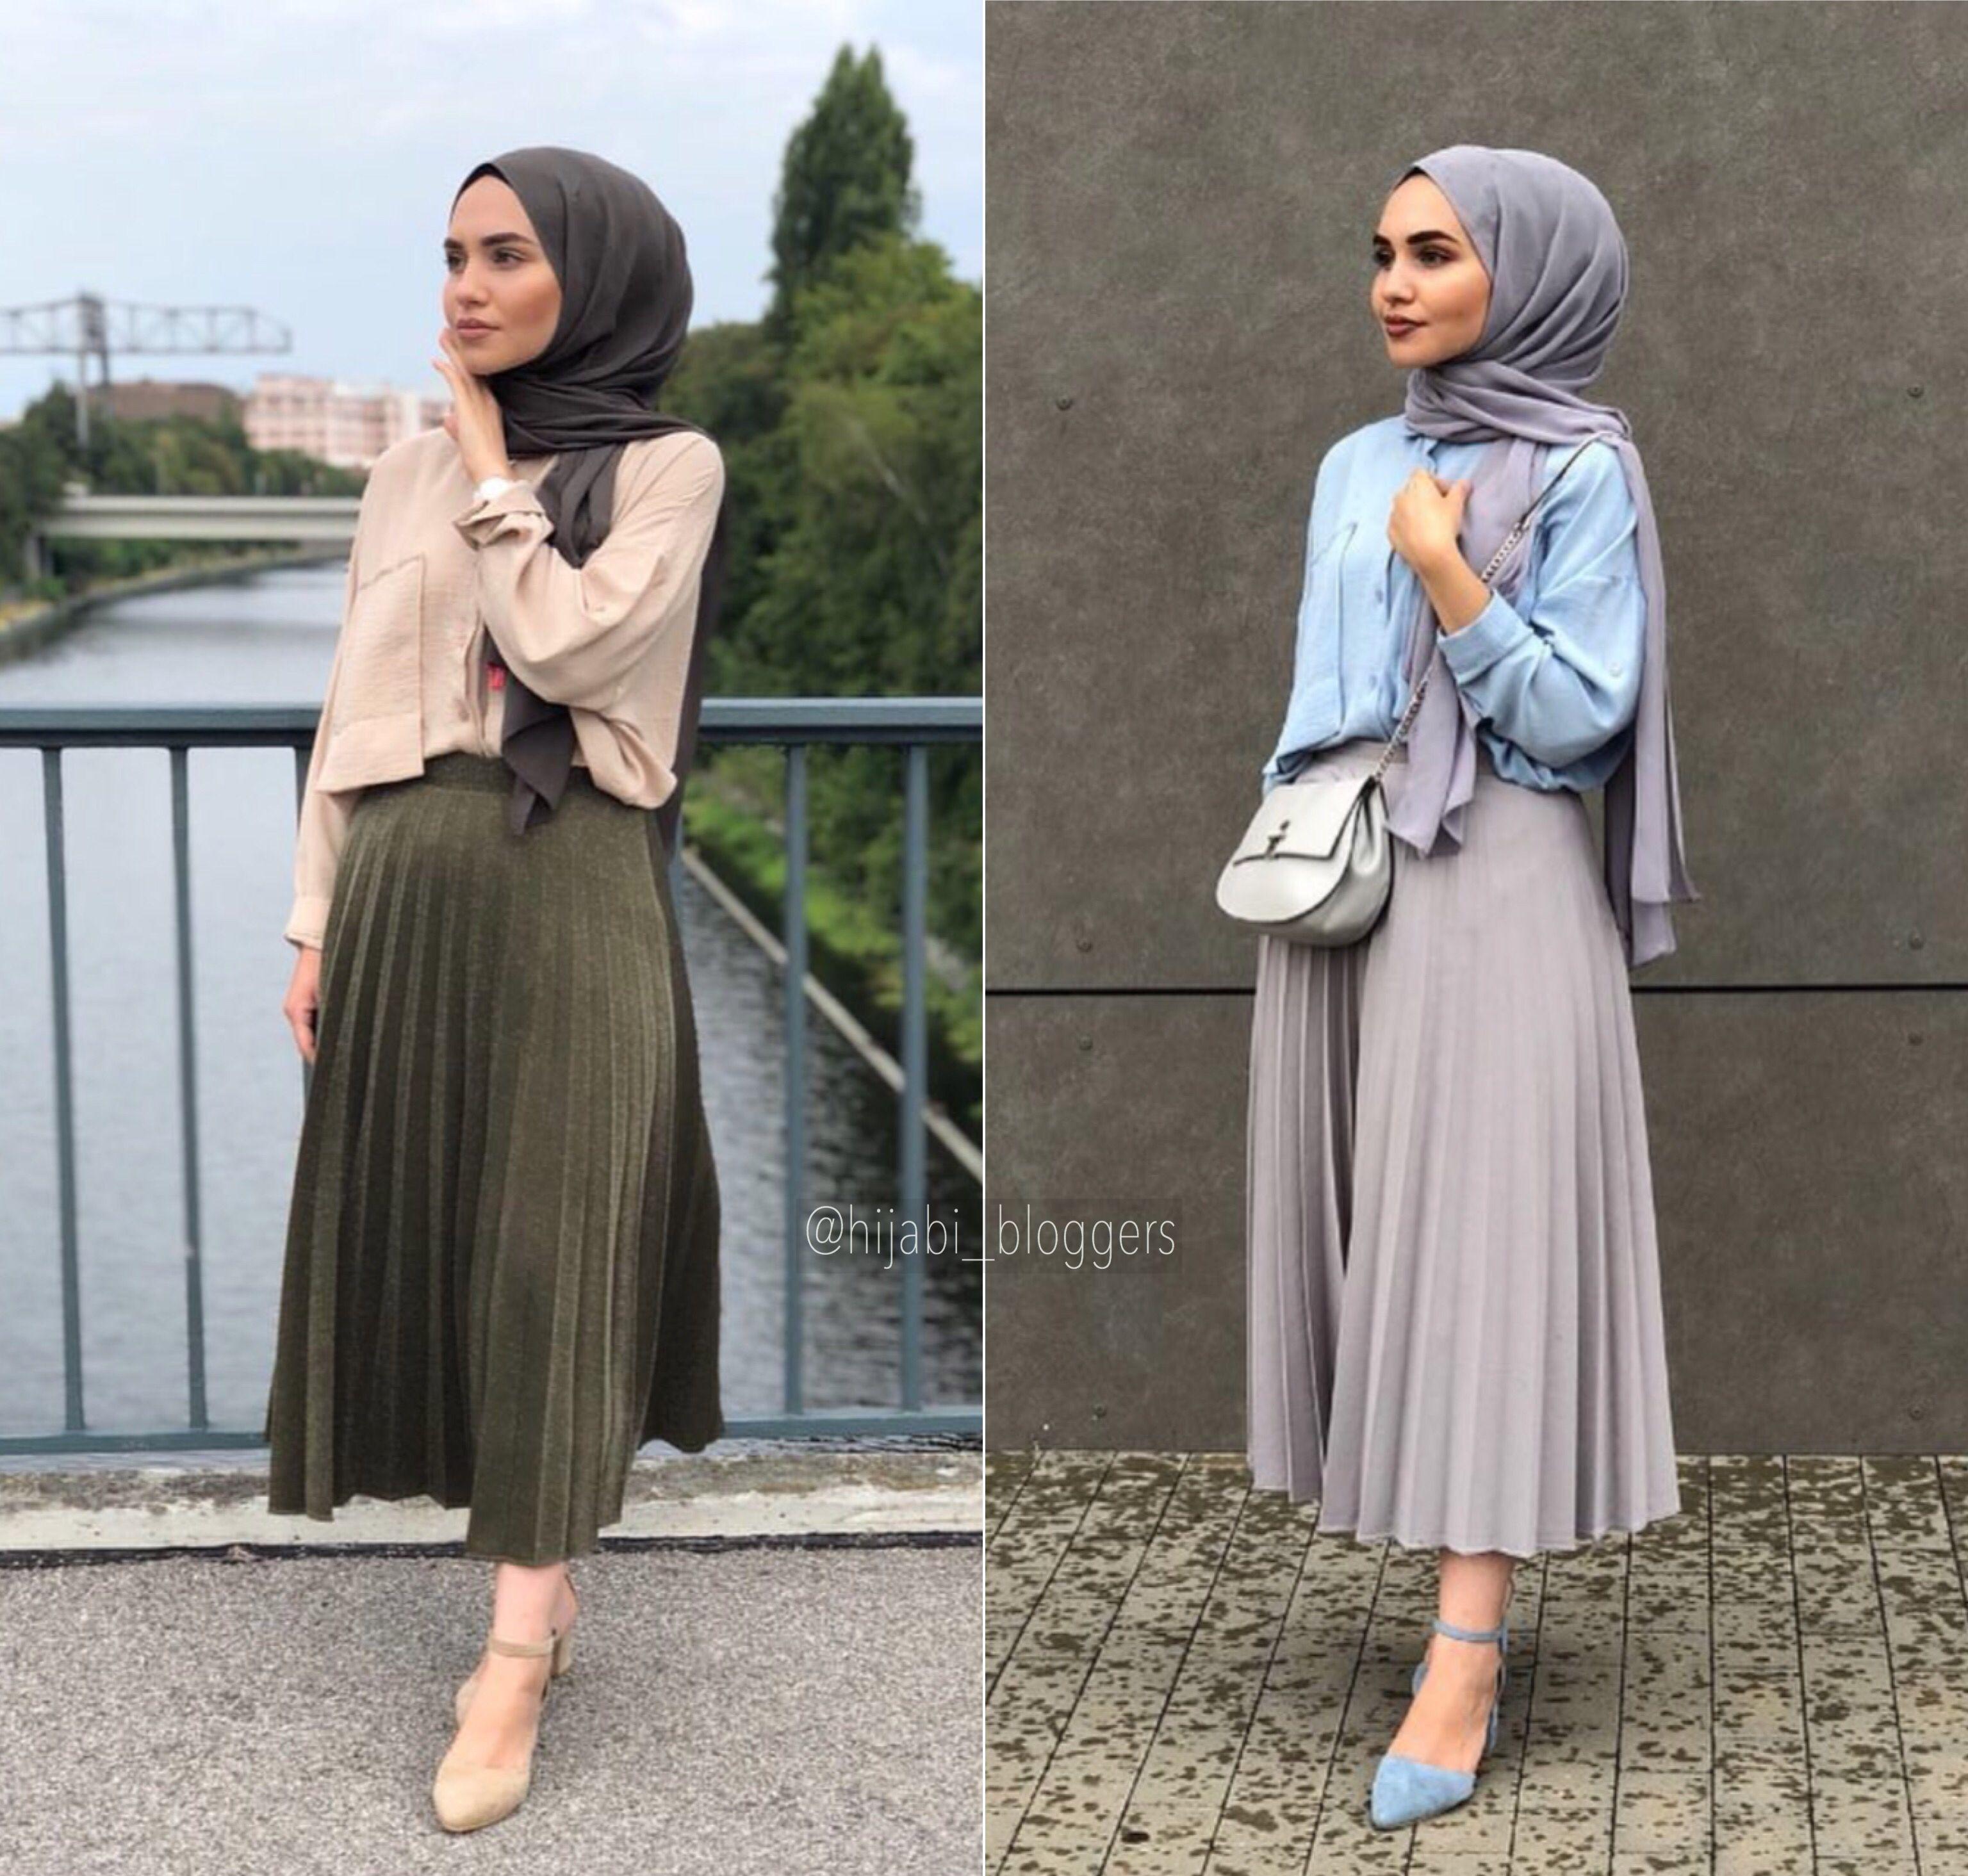 Vintage | Wanita, Model pakaian hijab, Gaya berpakaian